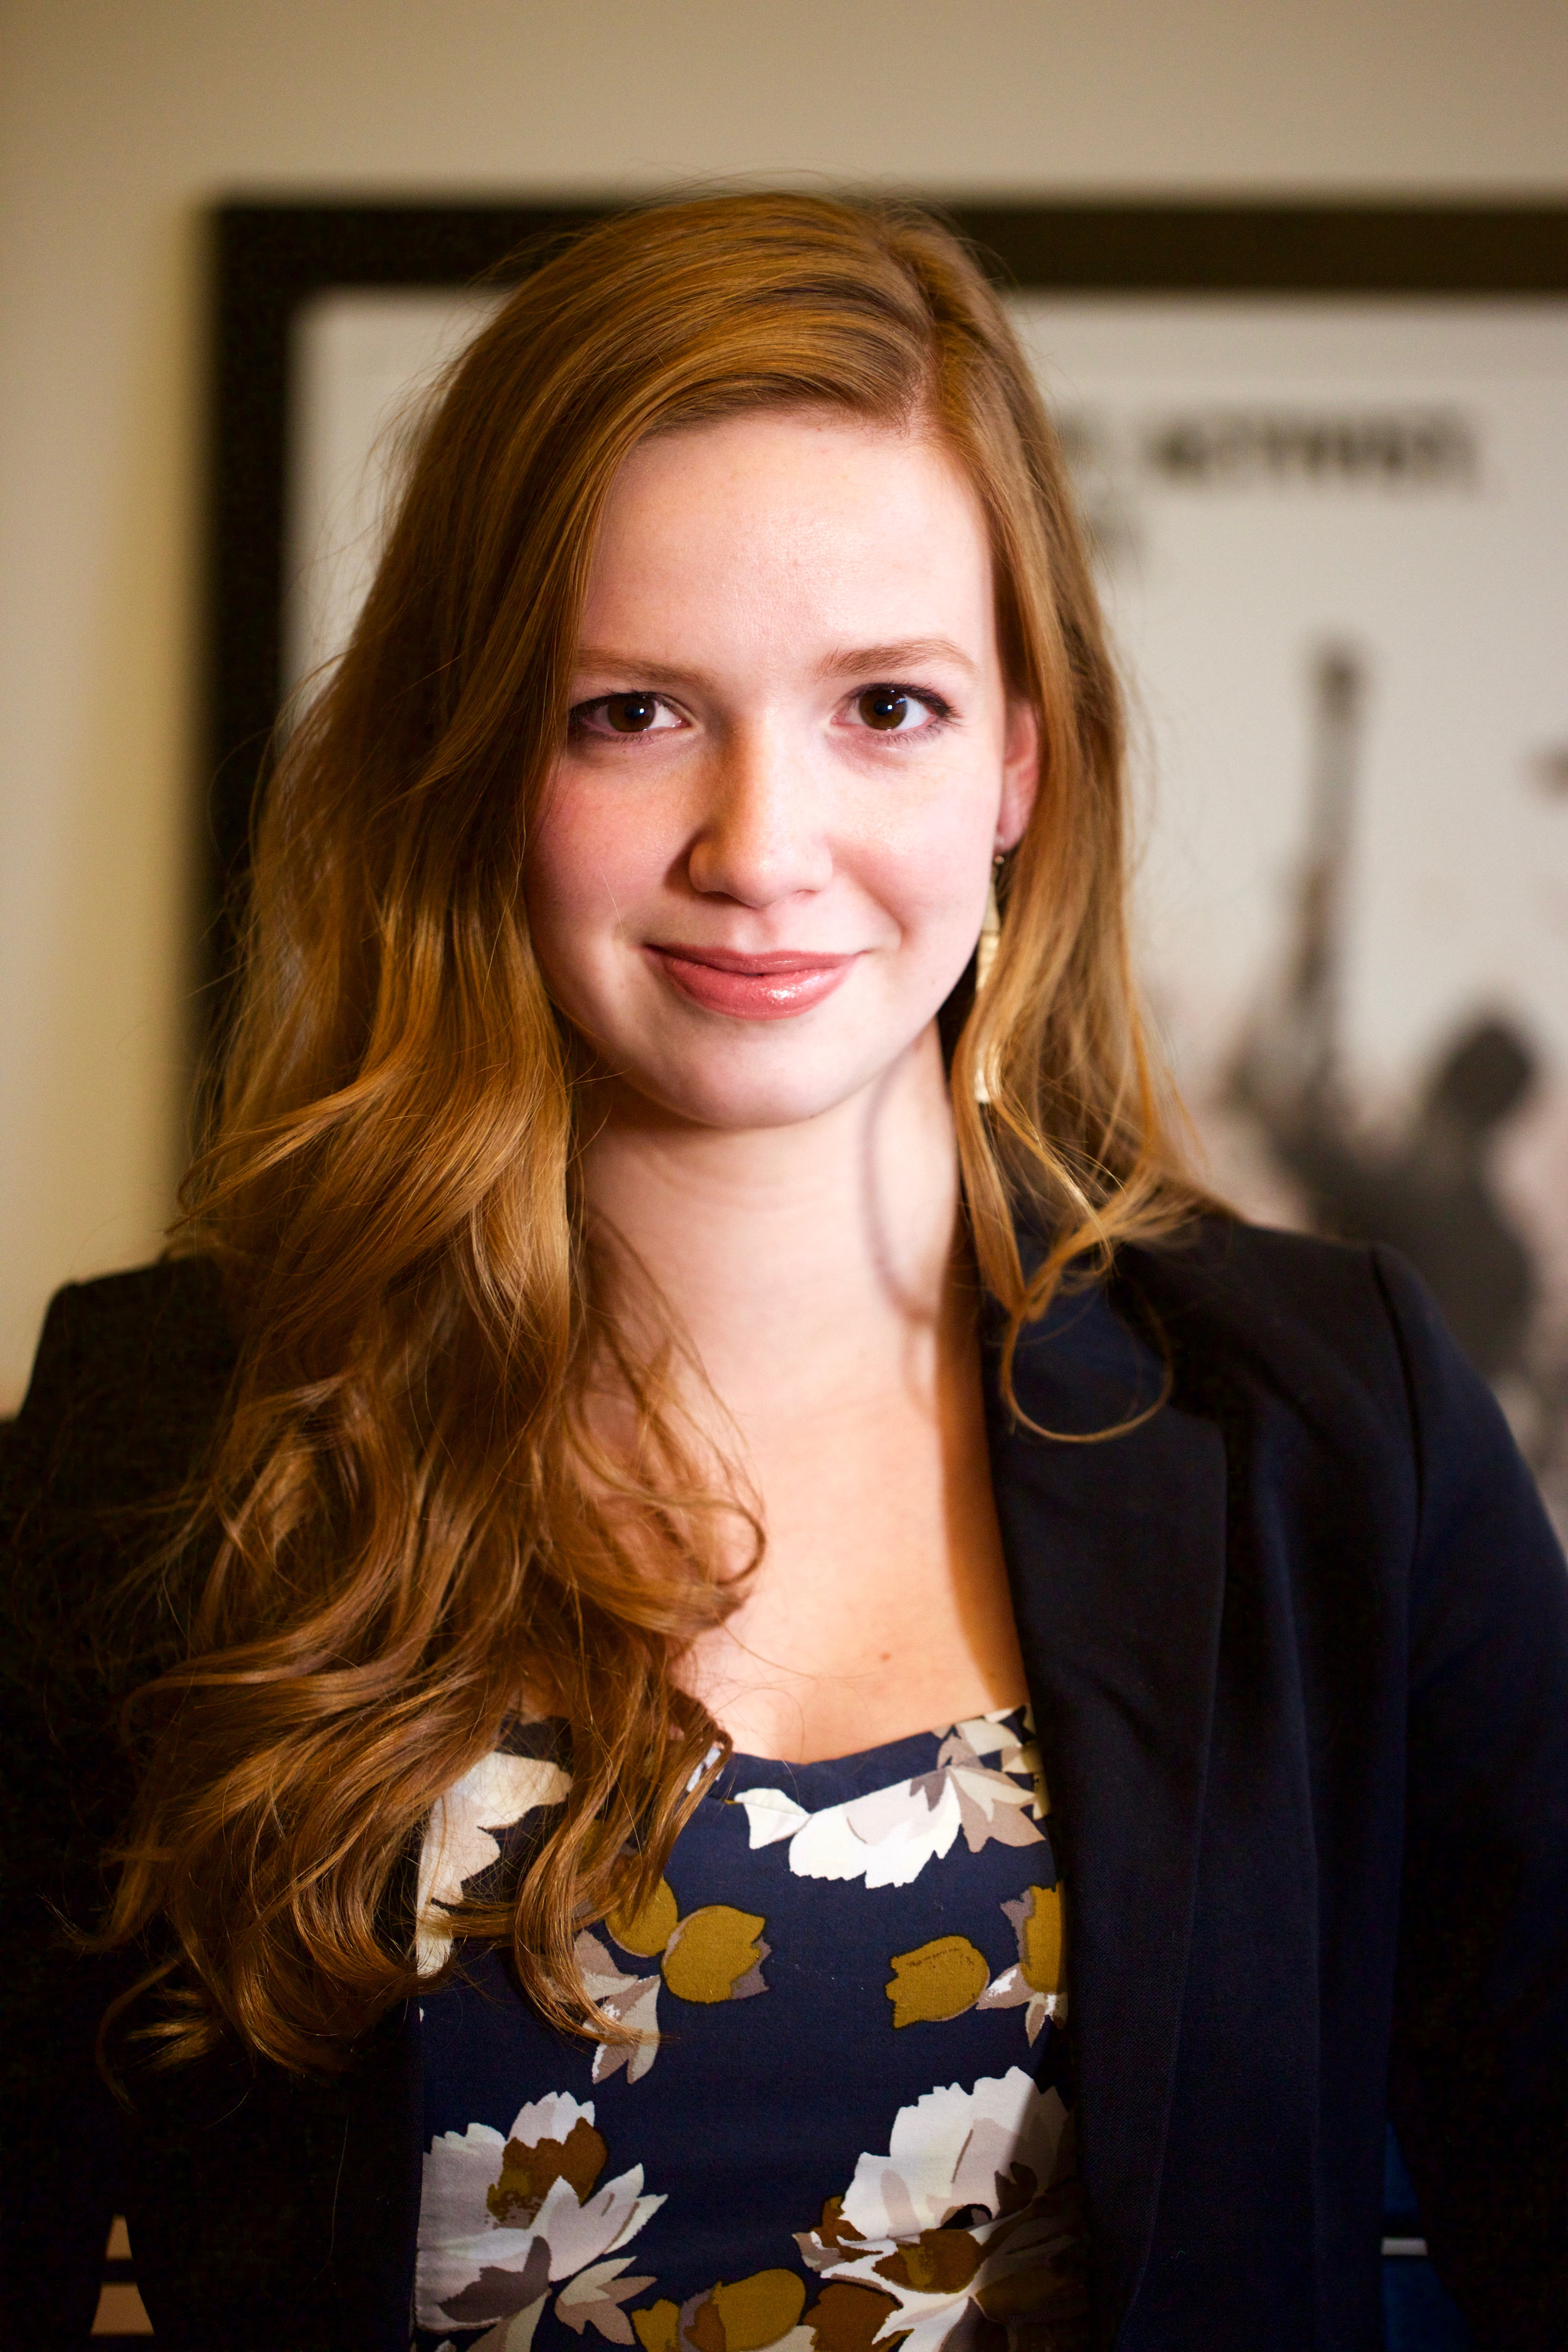 Chloe Maginity